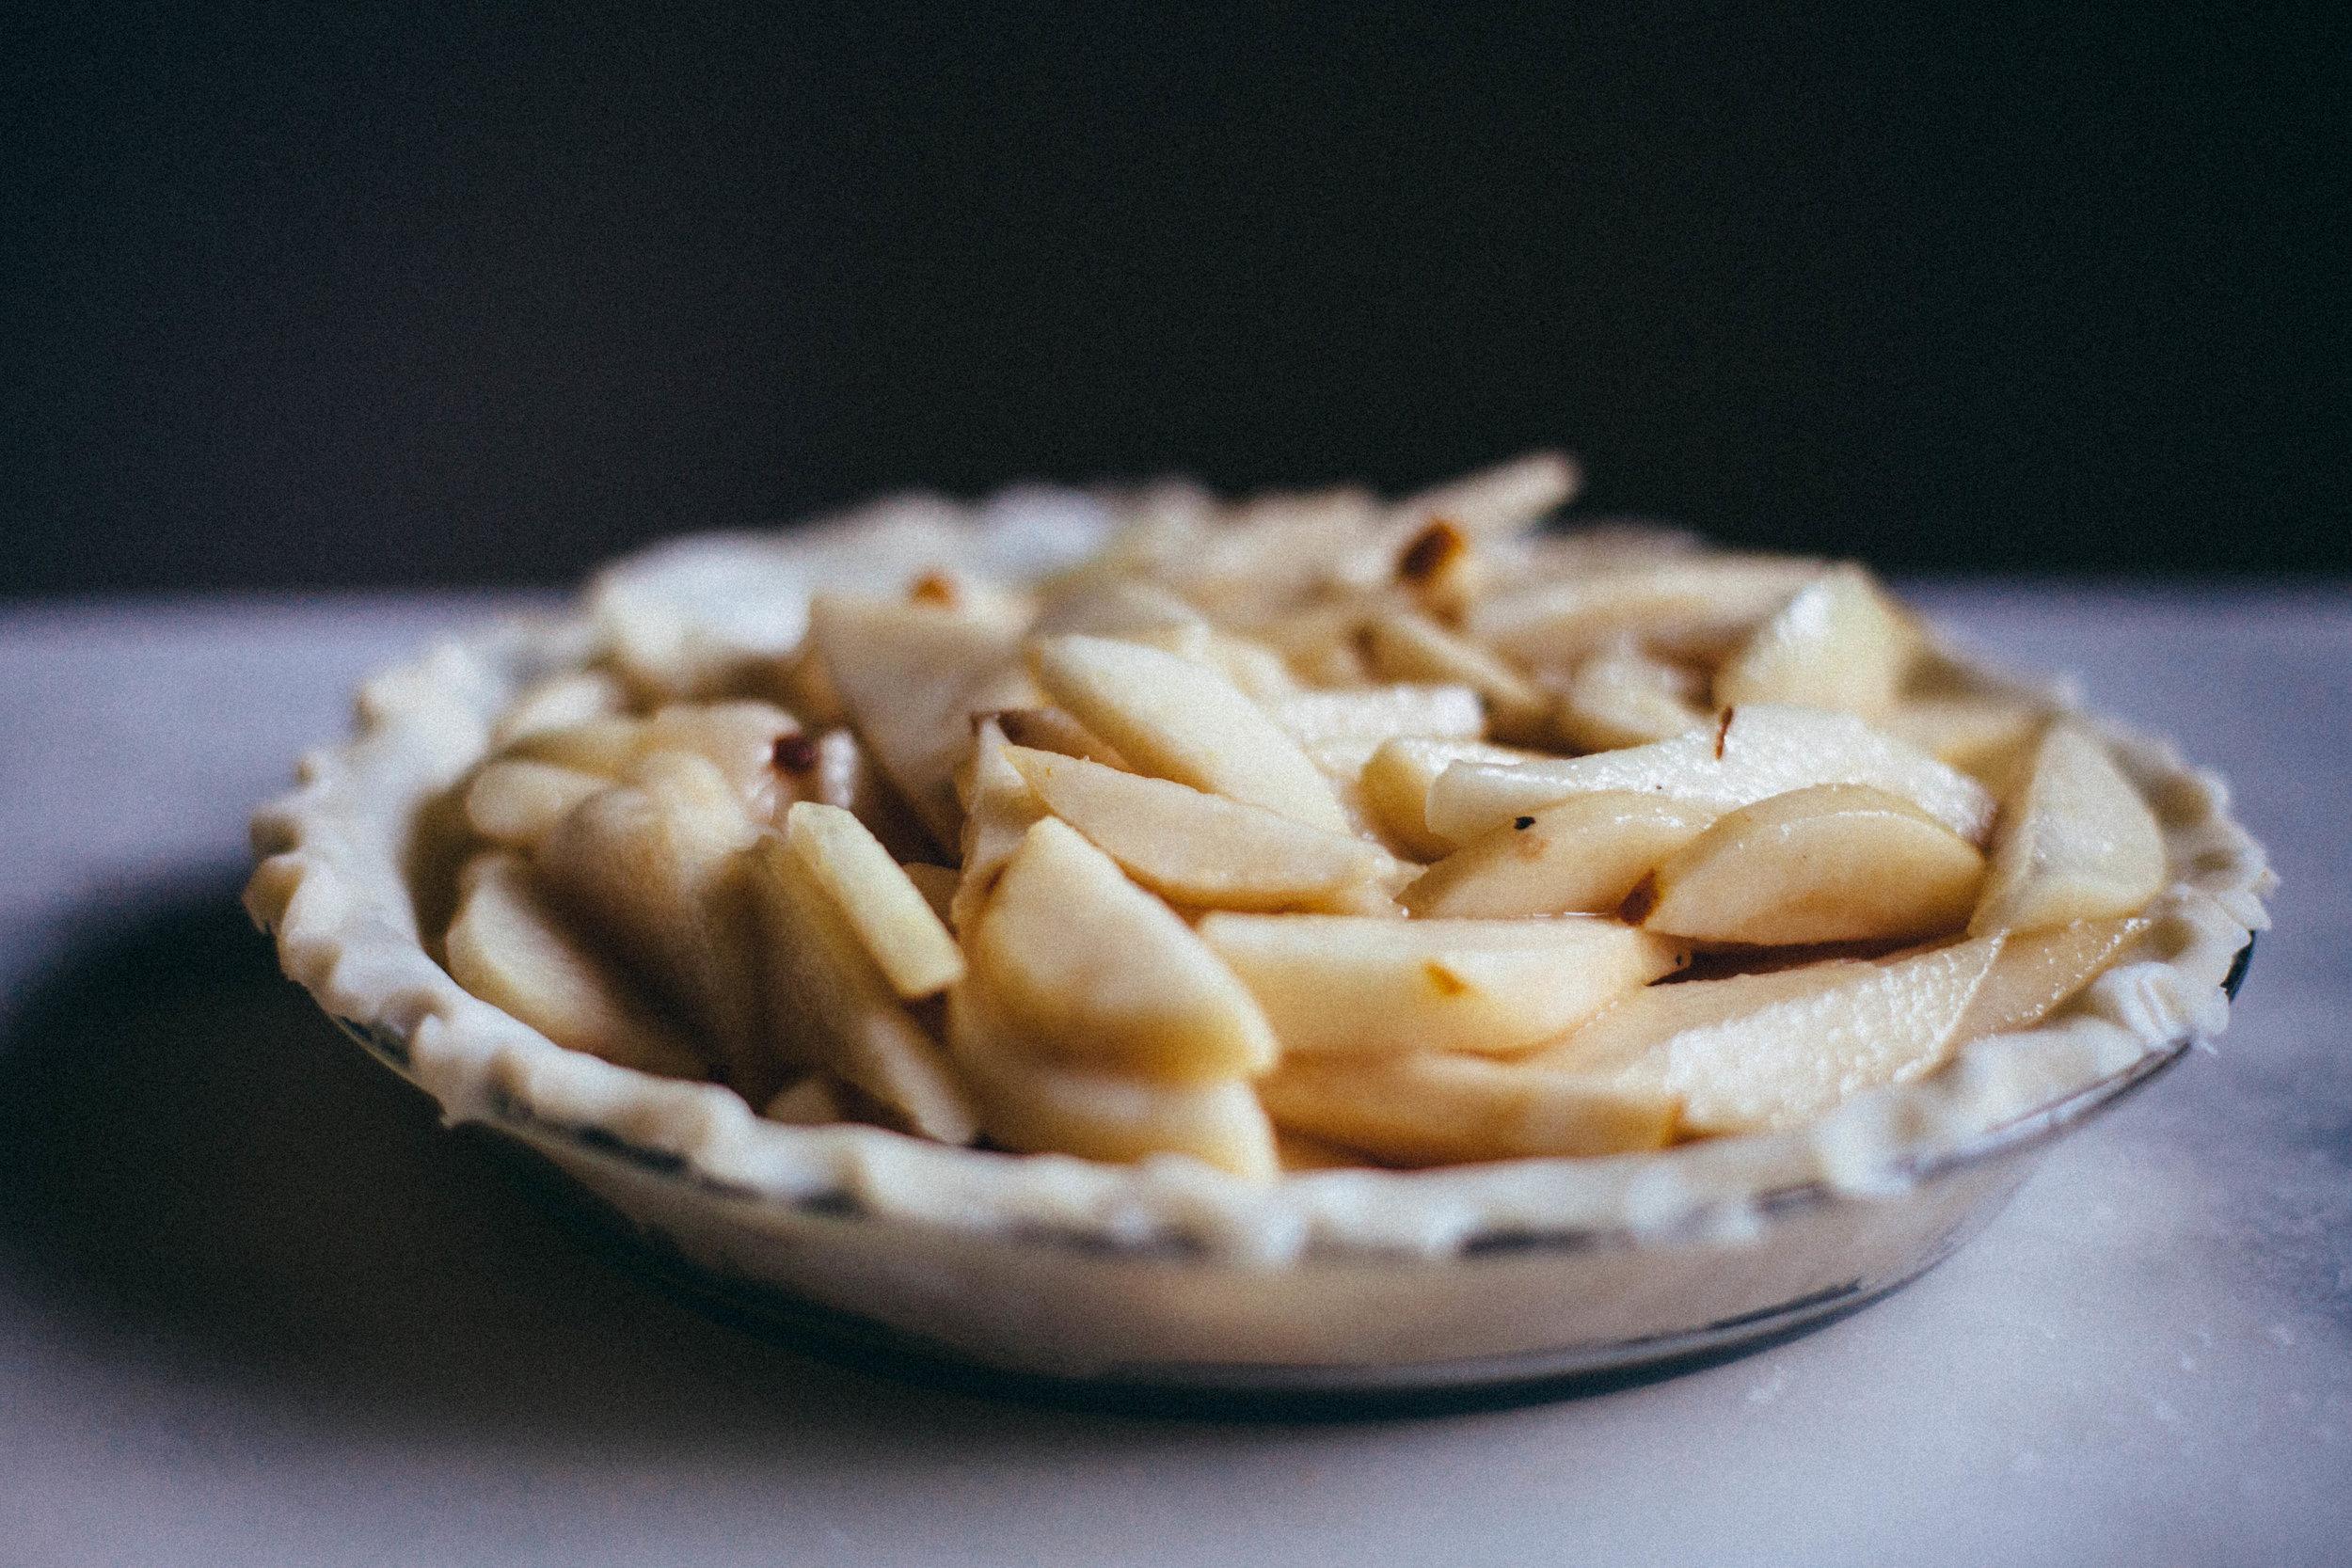 Winter Pear Streusel Pie with Salted Caramel Sauce - Tastemaker Blog